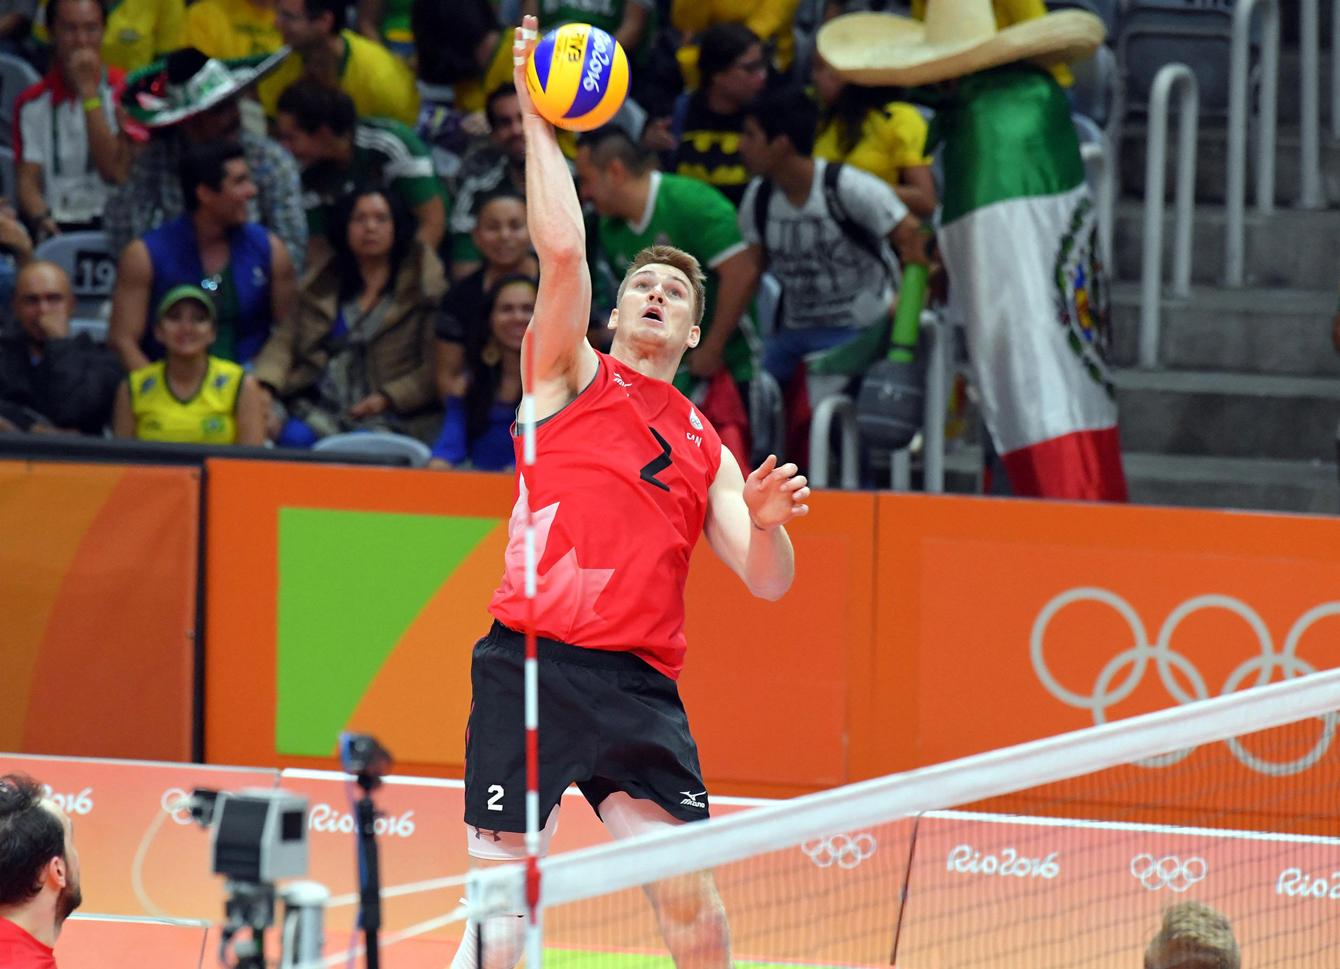 Rio 2016: Gordon Perrin, men's volleyball